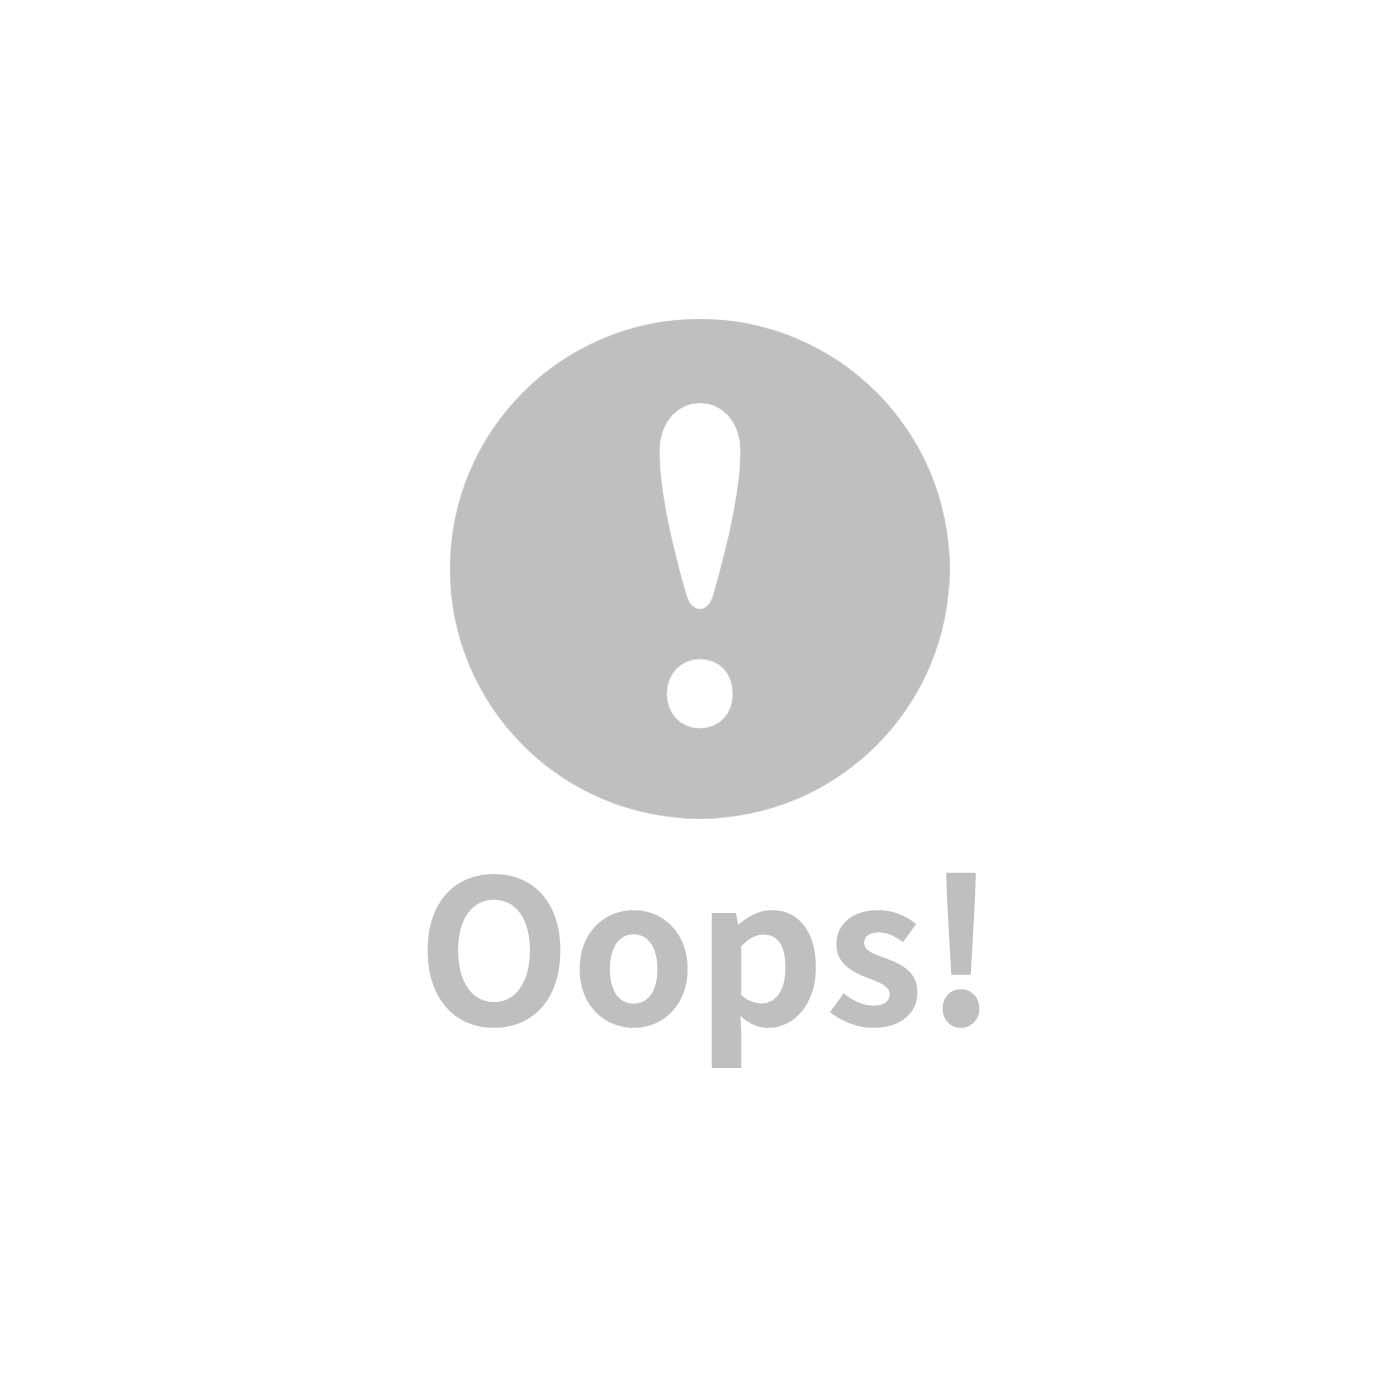 global affairs 童話手工編織乖乖兔音樂鈴-舒眠藍